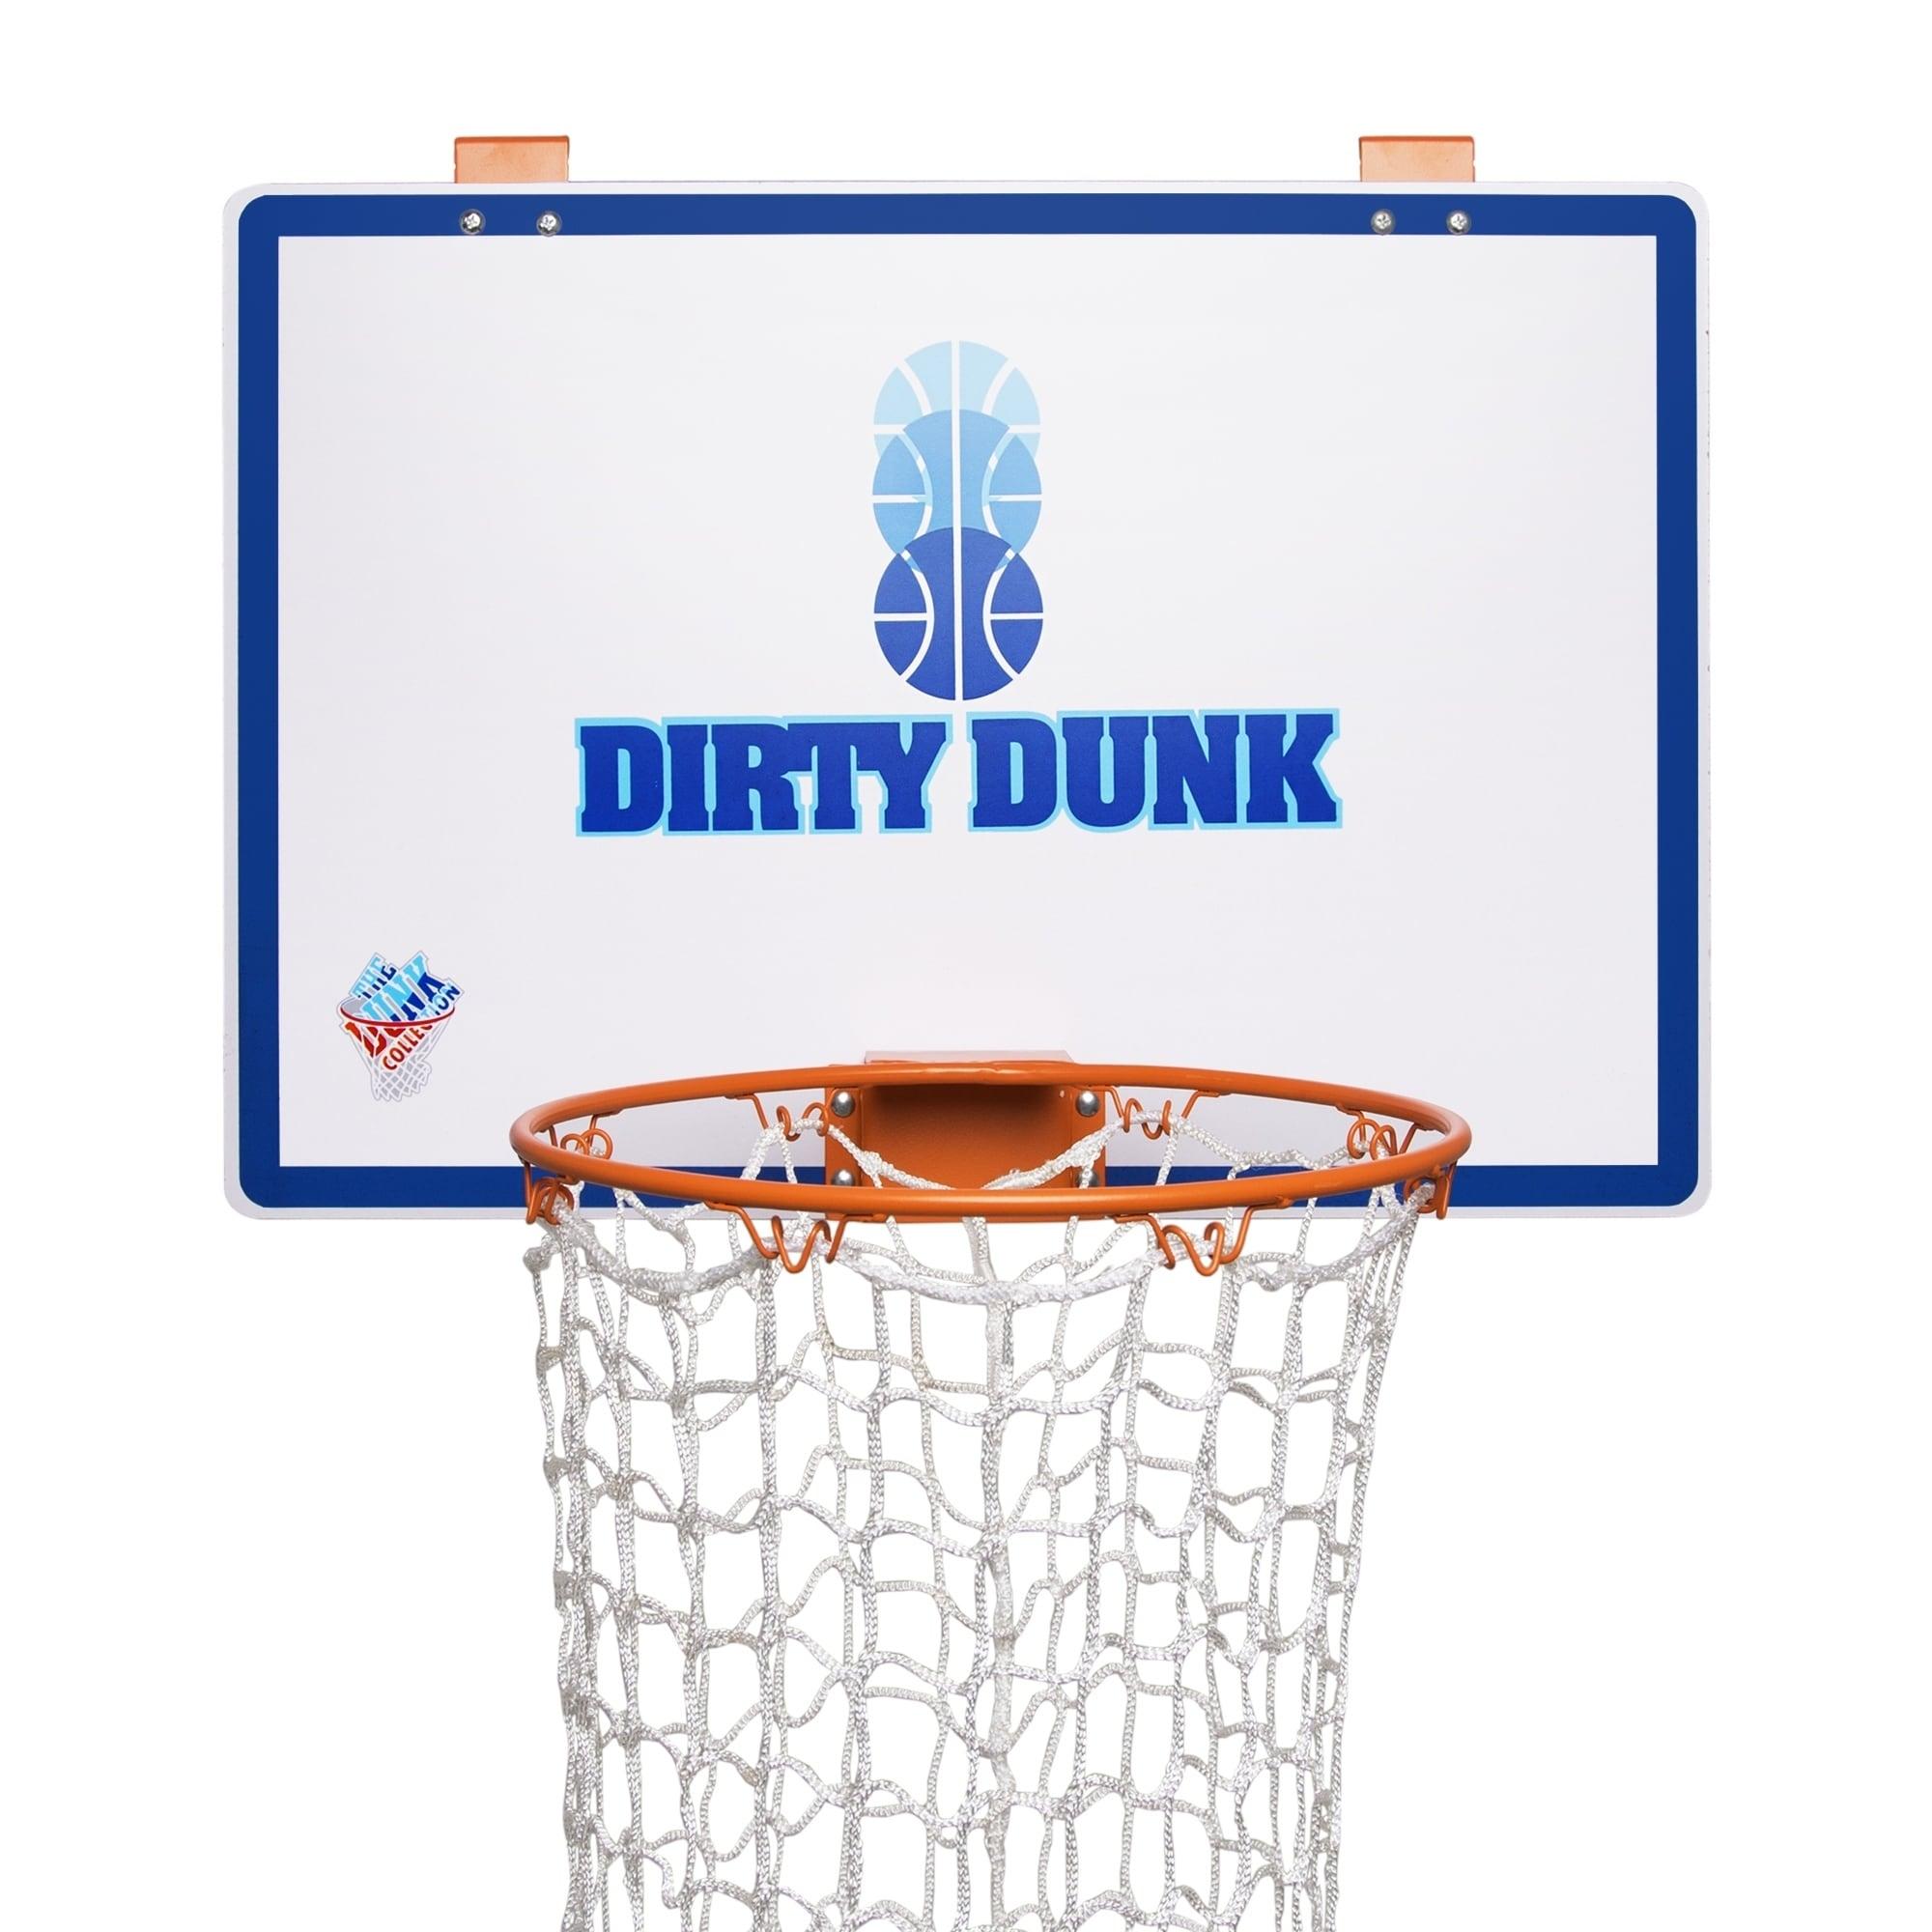 The Dirty Dunk - The Original Over-the-Door Basketball Hoop ...